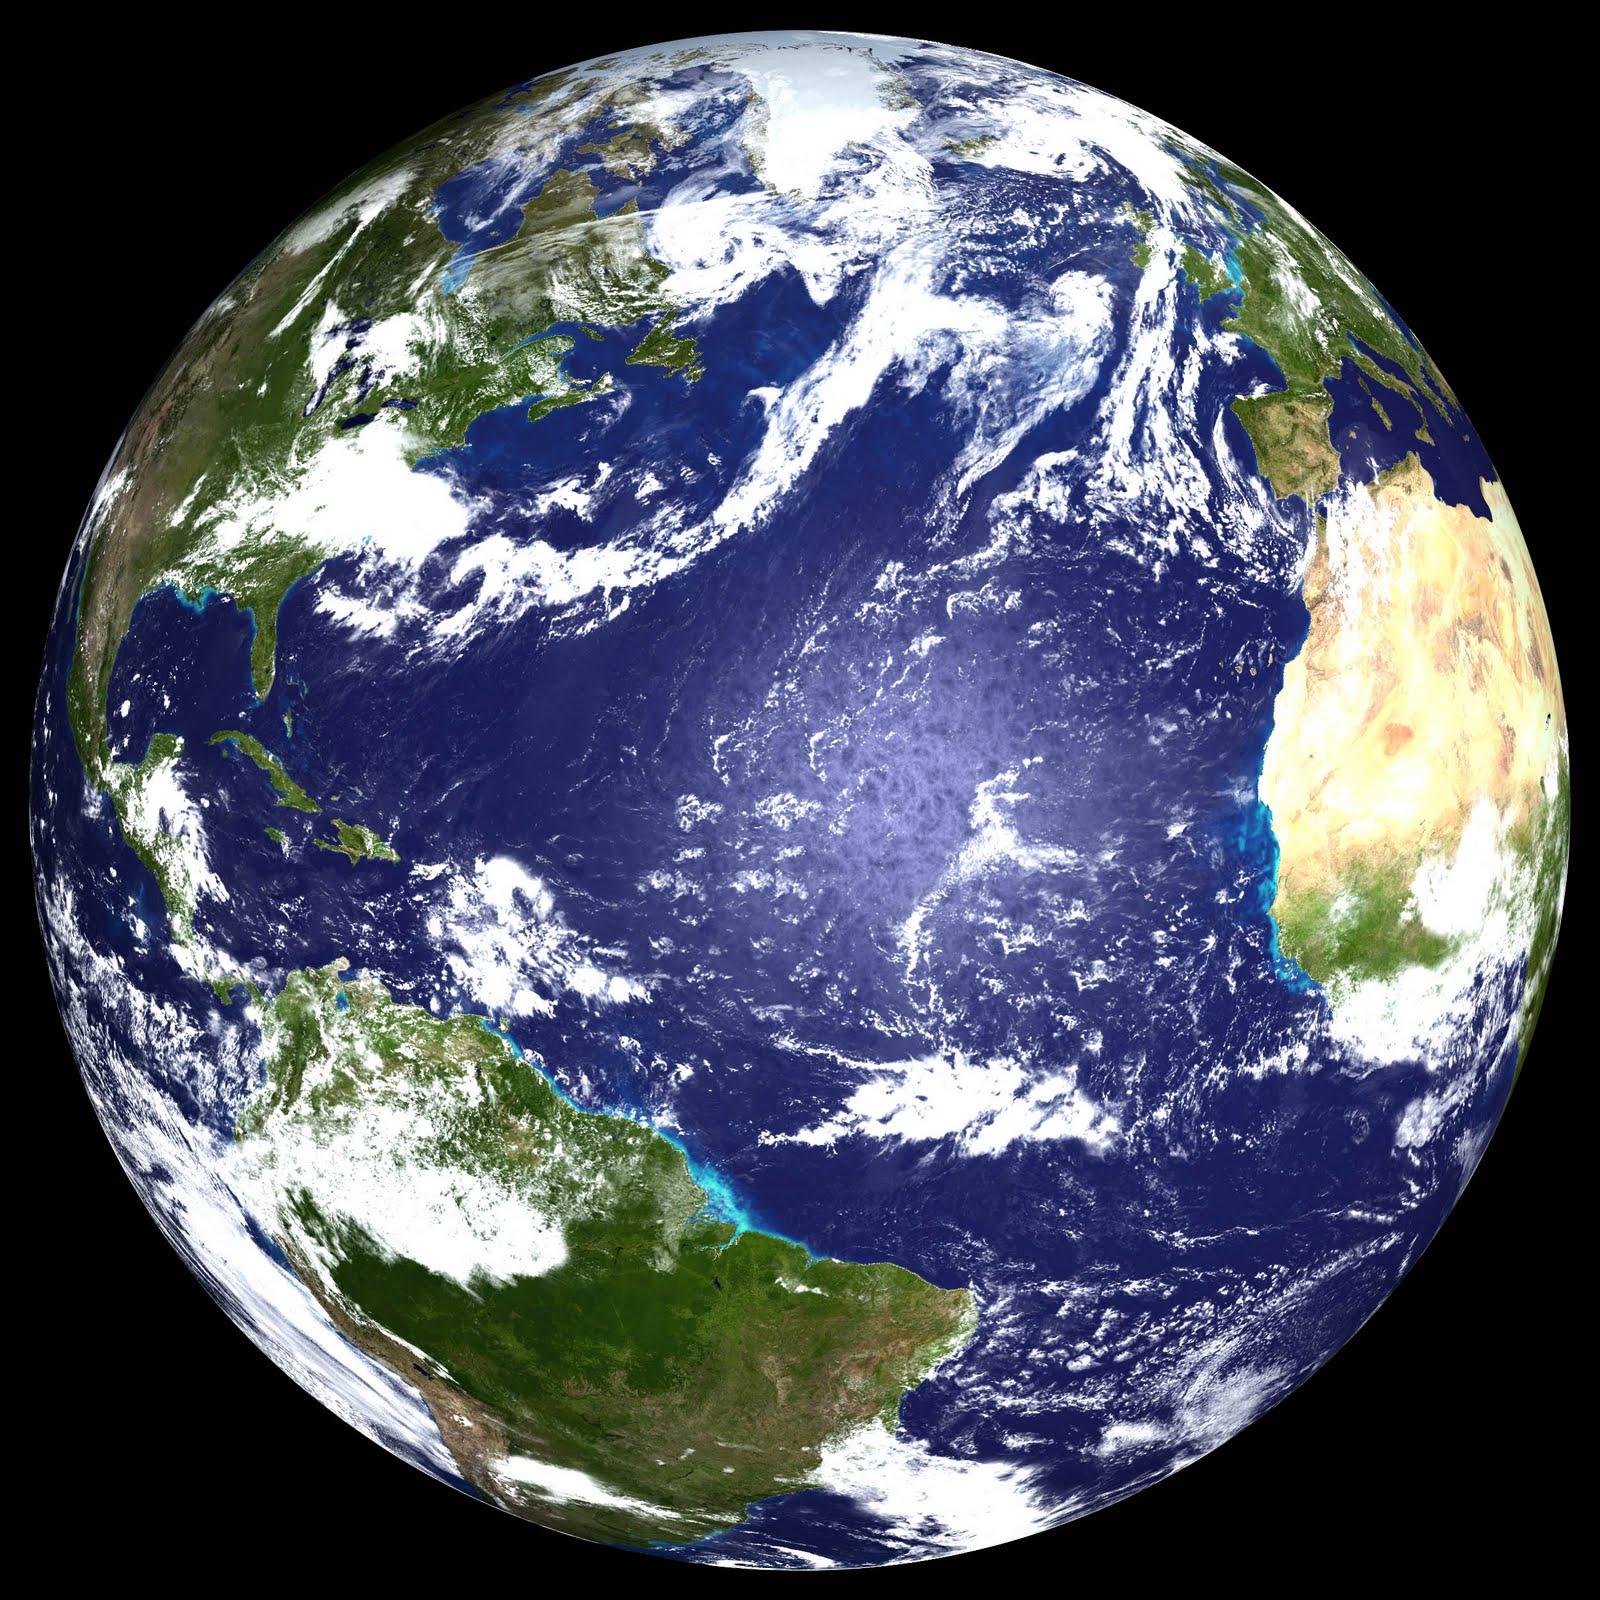 solar system earth - photo #3